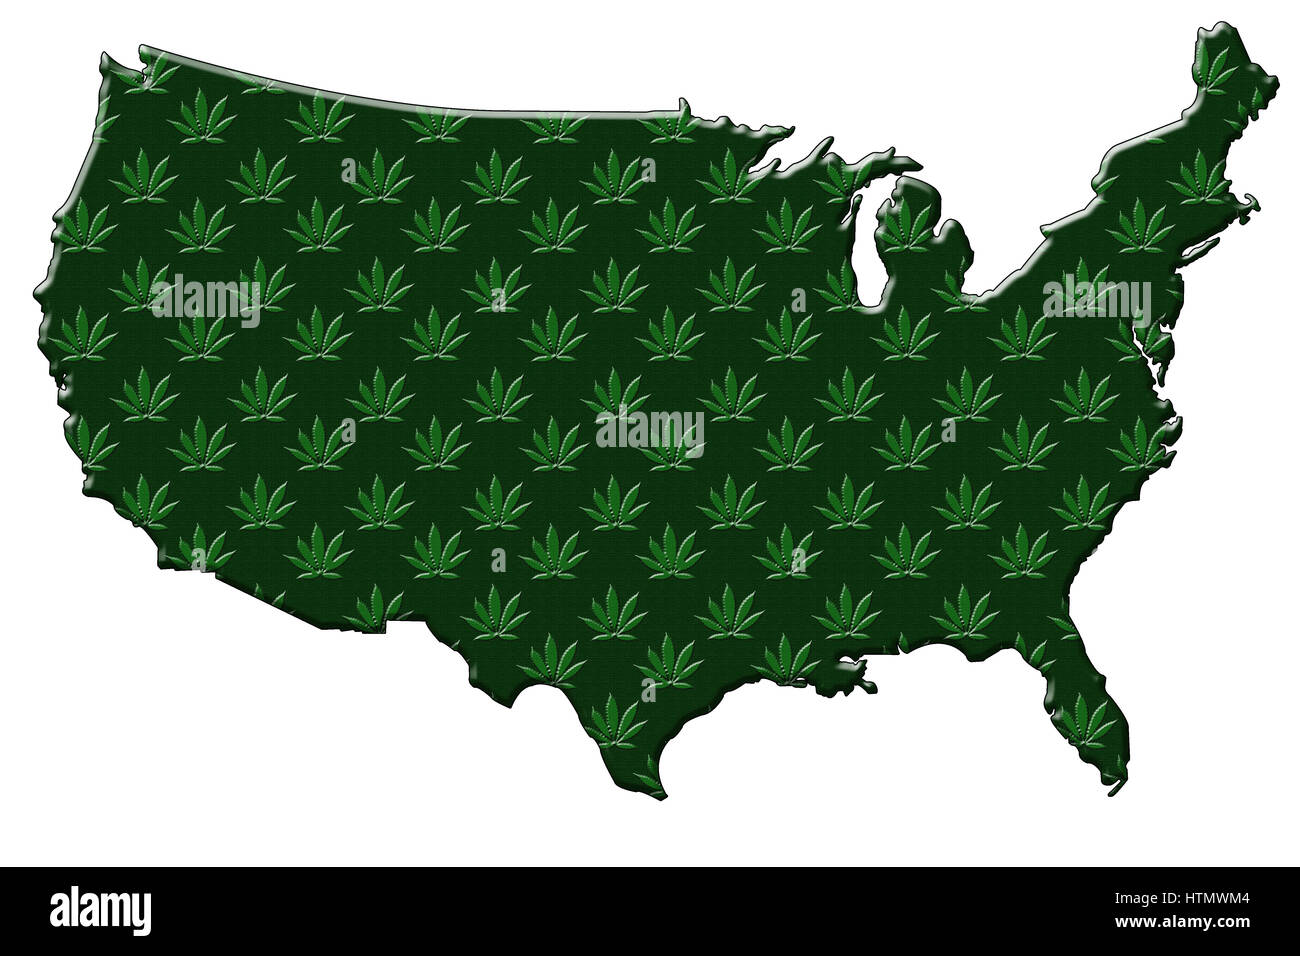 how to buy marijuana stocks in us